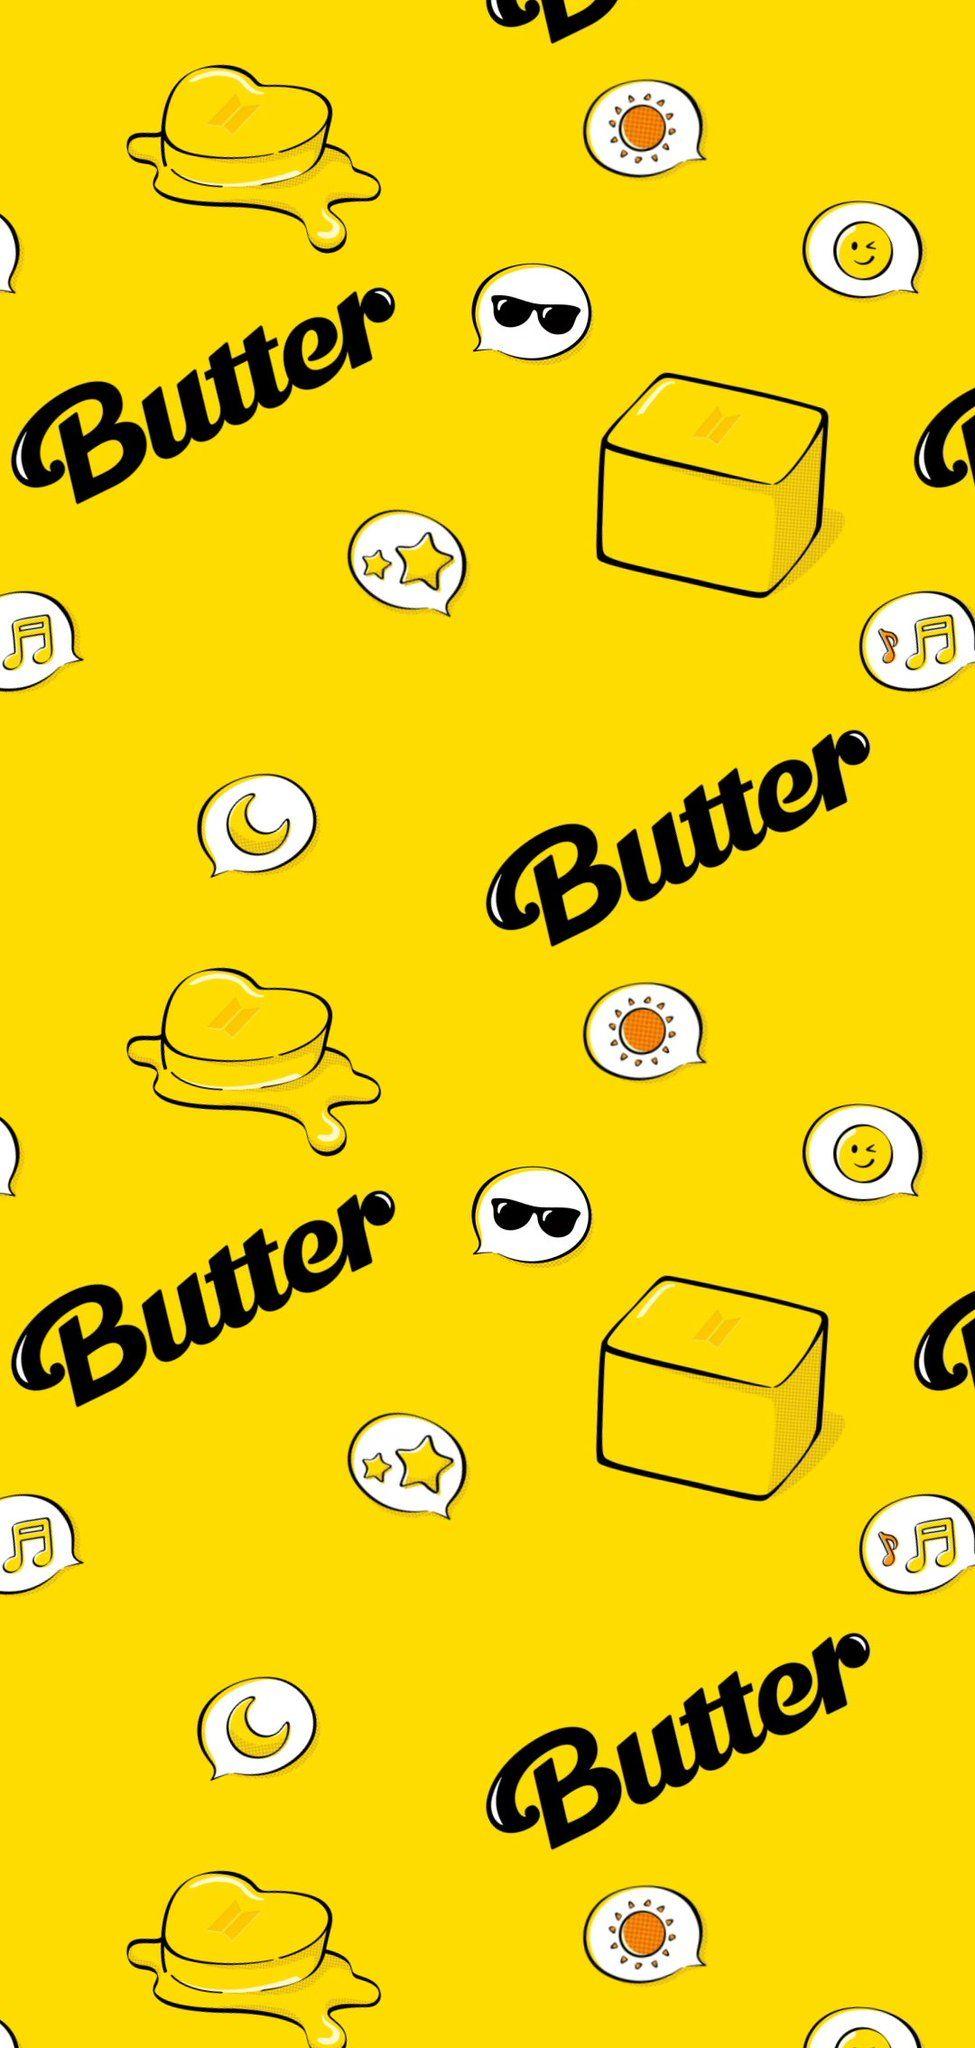 On Twitter In 2021 Bts Wallpaper Desktop Bts Wallpaper Bts Book Bts wallpaper butter era